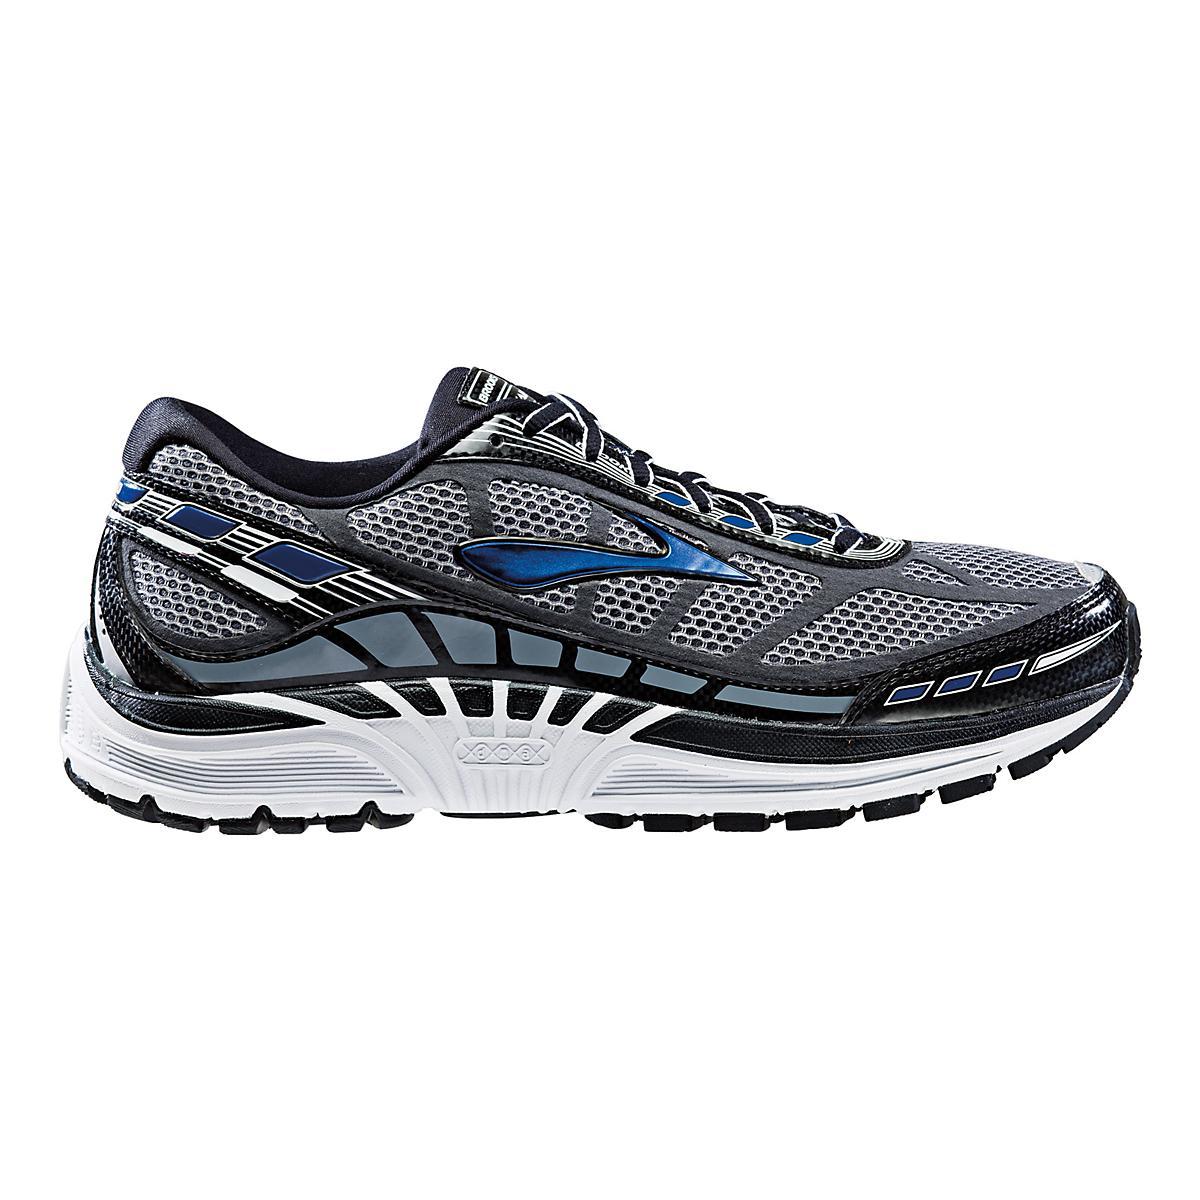 deb0e6cbe8d Mens Brooks Dyad 8 Running Shoe at Road Runner Sports